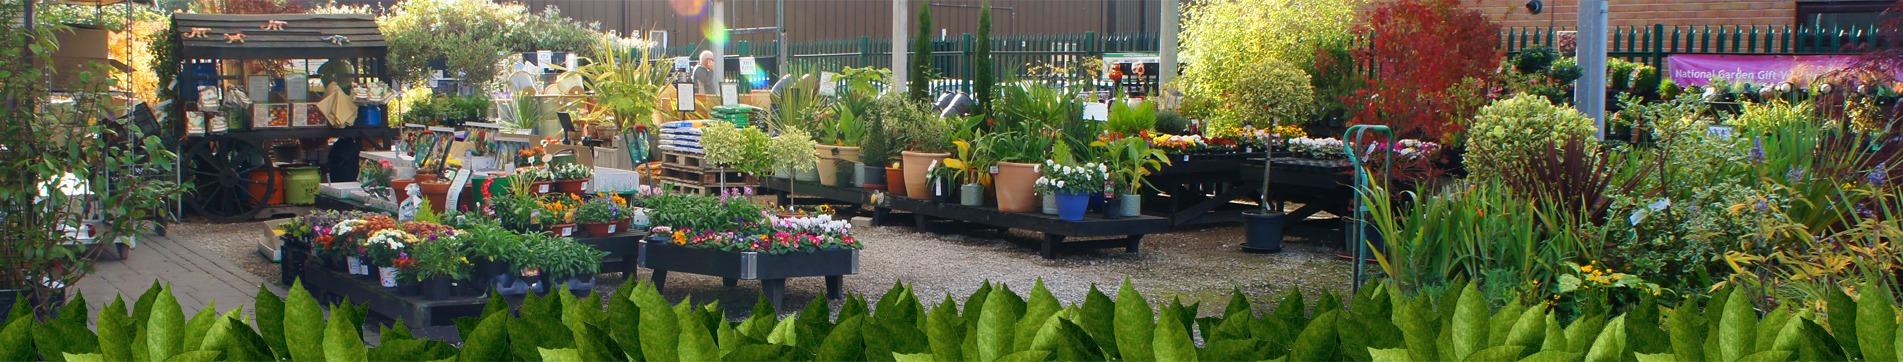 quality plants